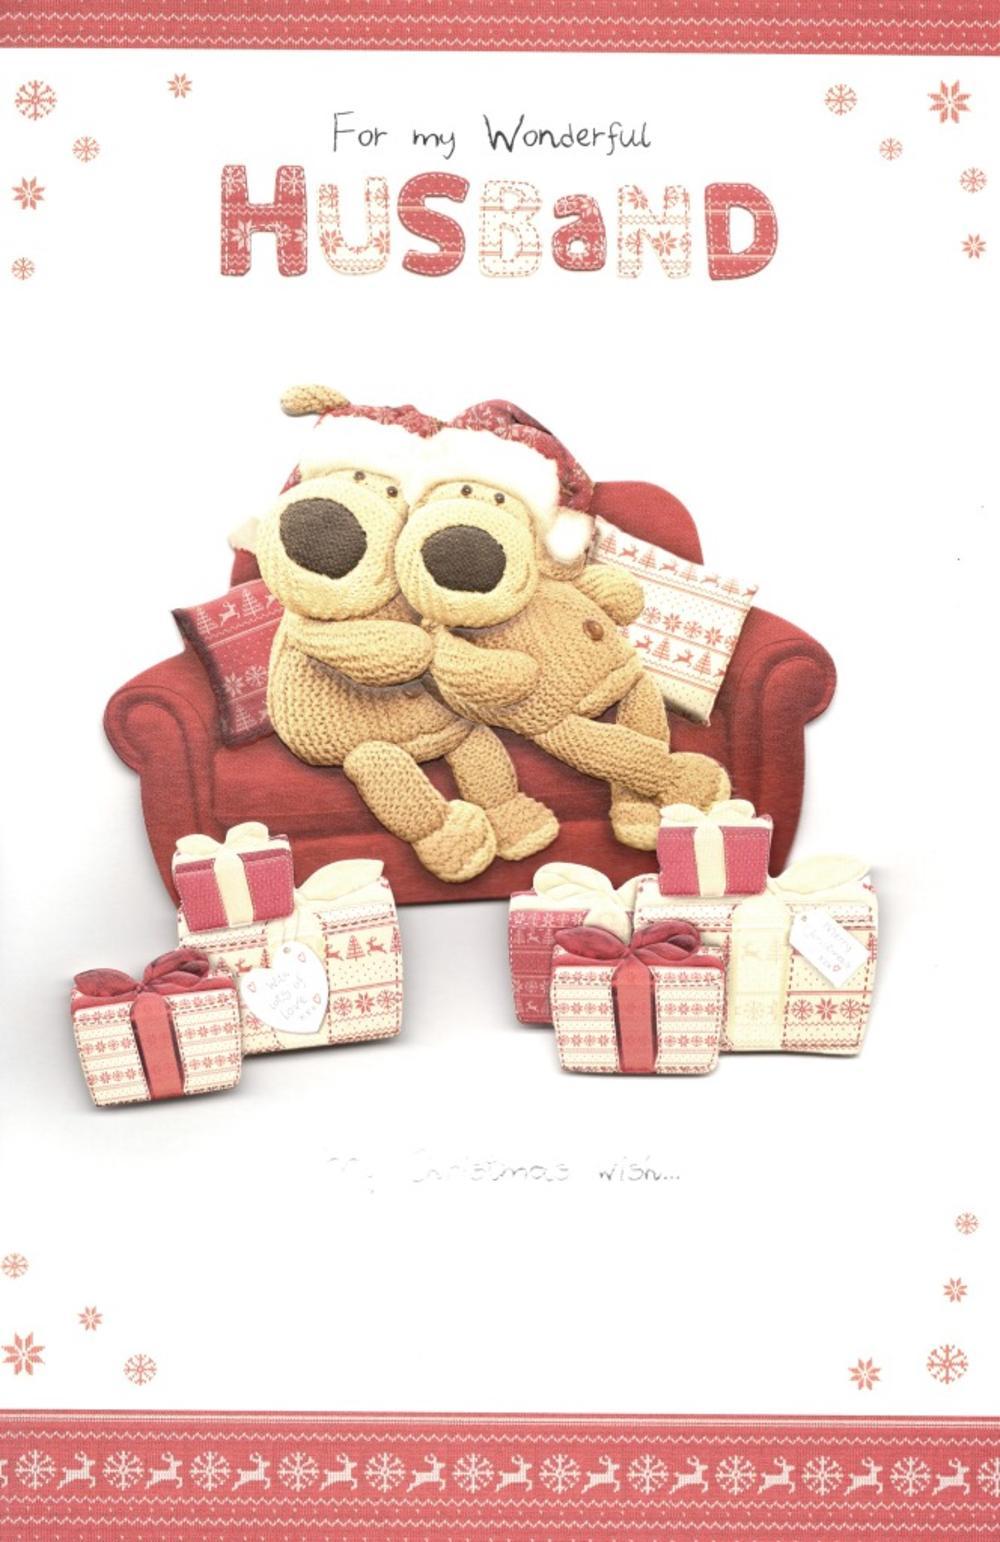 Boofle Wonderful Husband Christmas Greeting Card